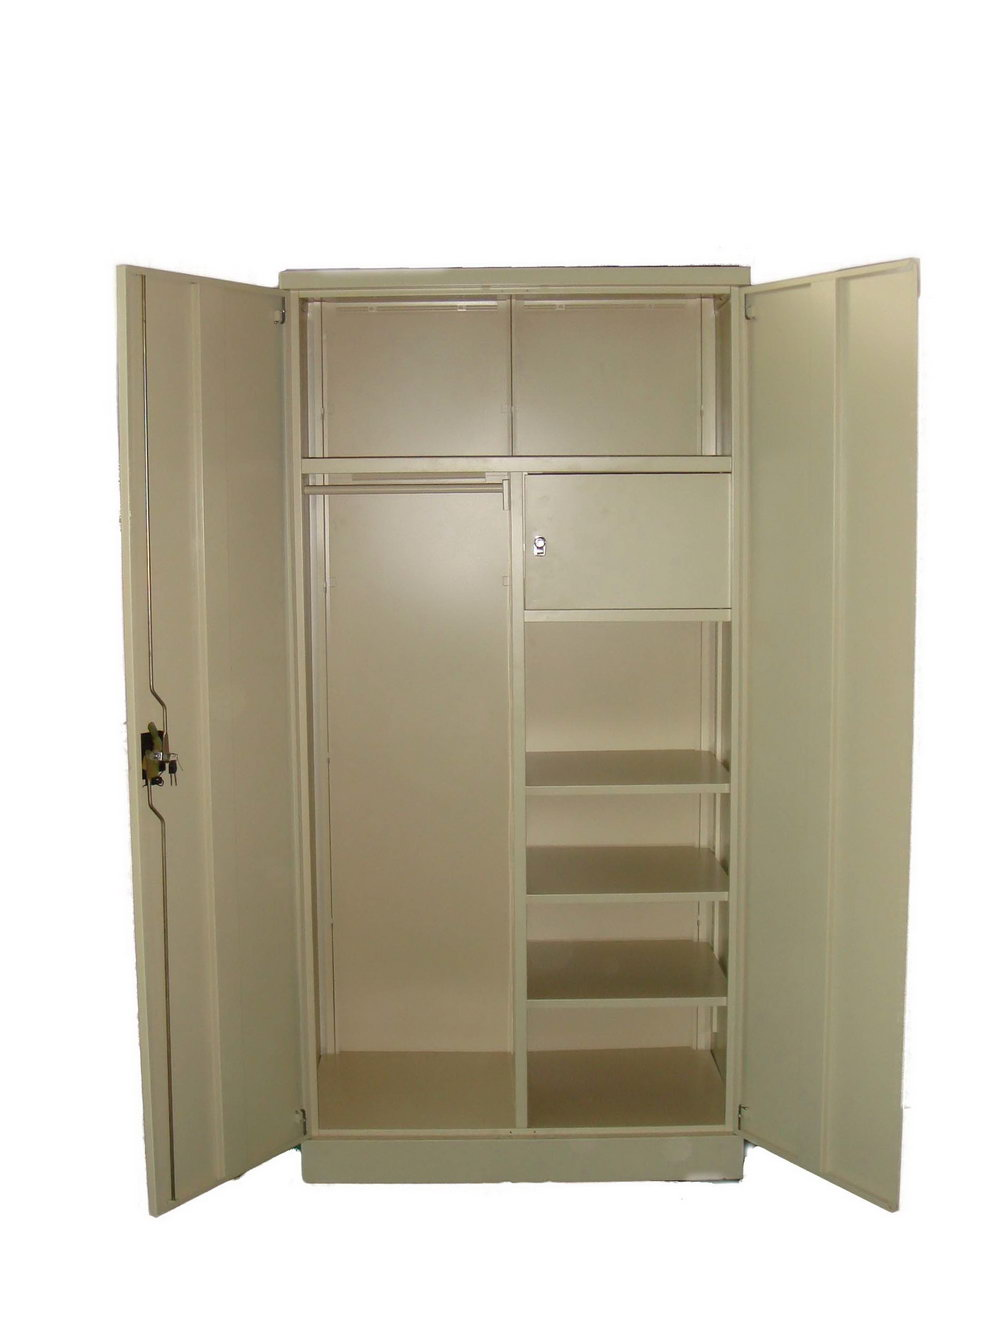 Ikea Storage Cabinets Singapore